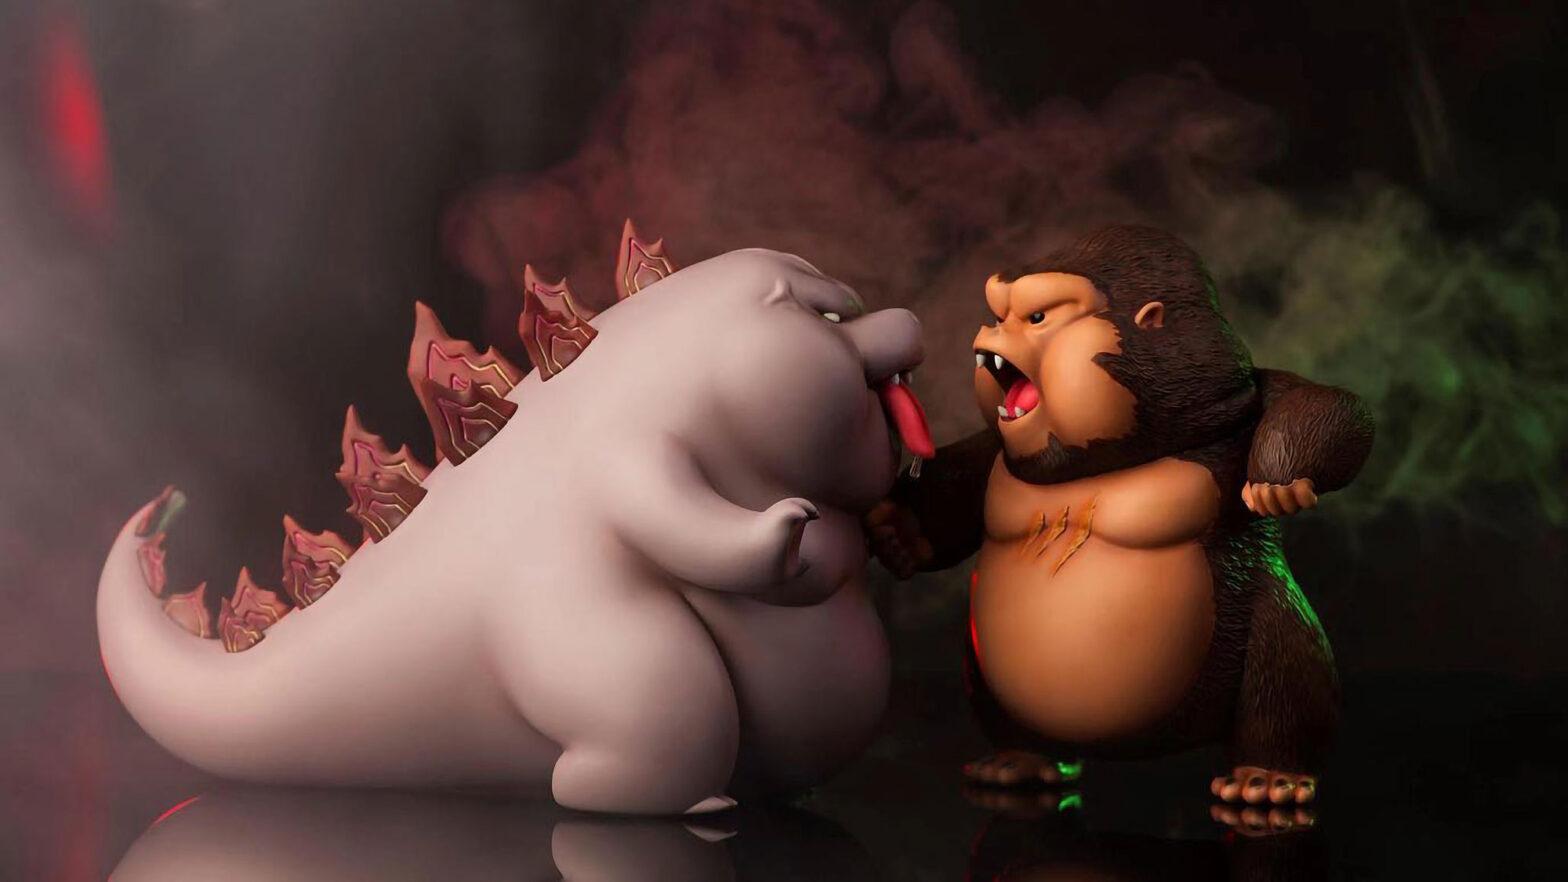 Cute Godzilla vs Kong Parody Figures